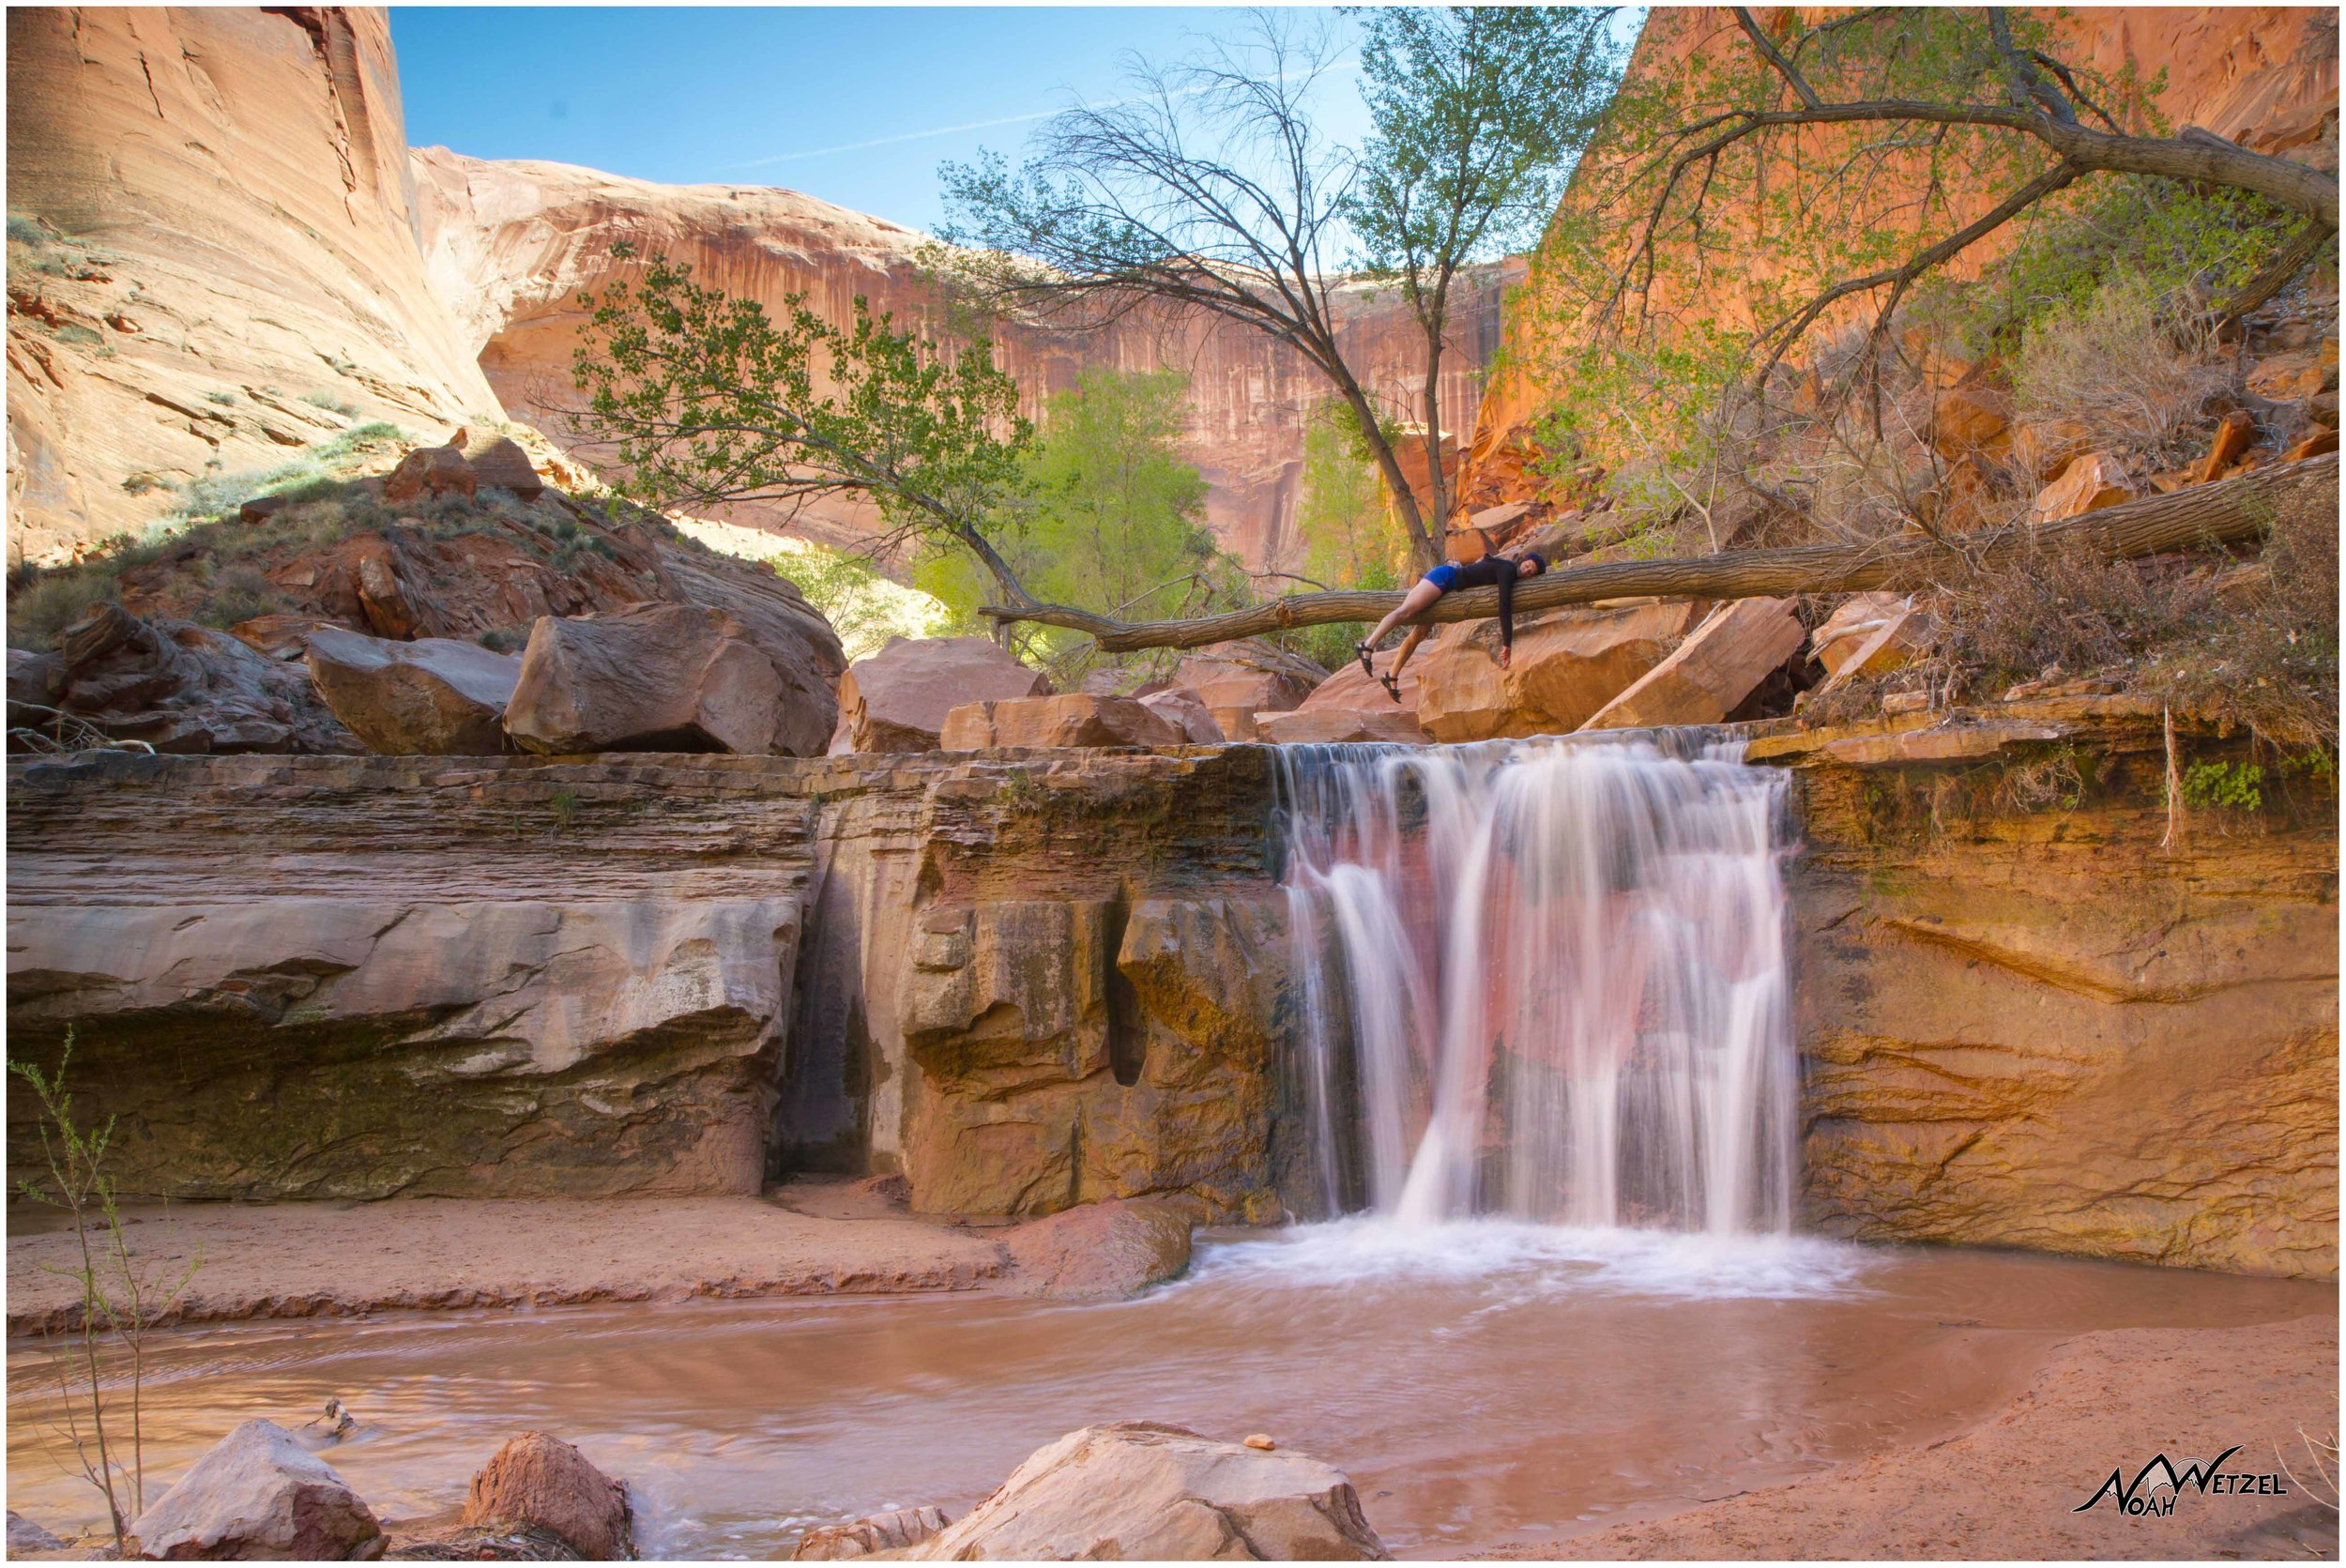 Kelsey kicken back @ the Waterfall Oasis in Coyote Gulch. Escalante, Utah